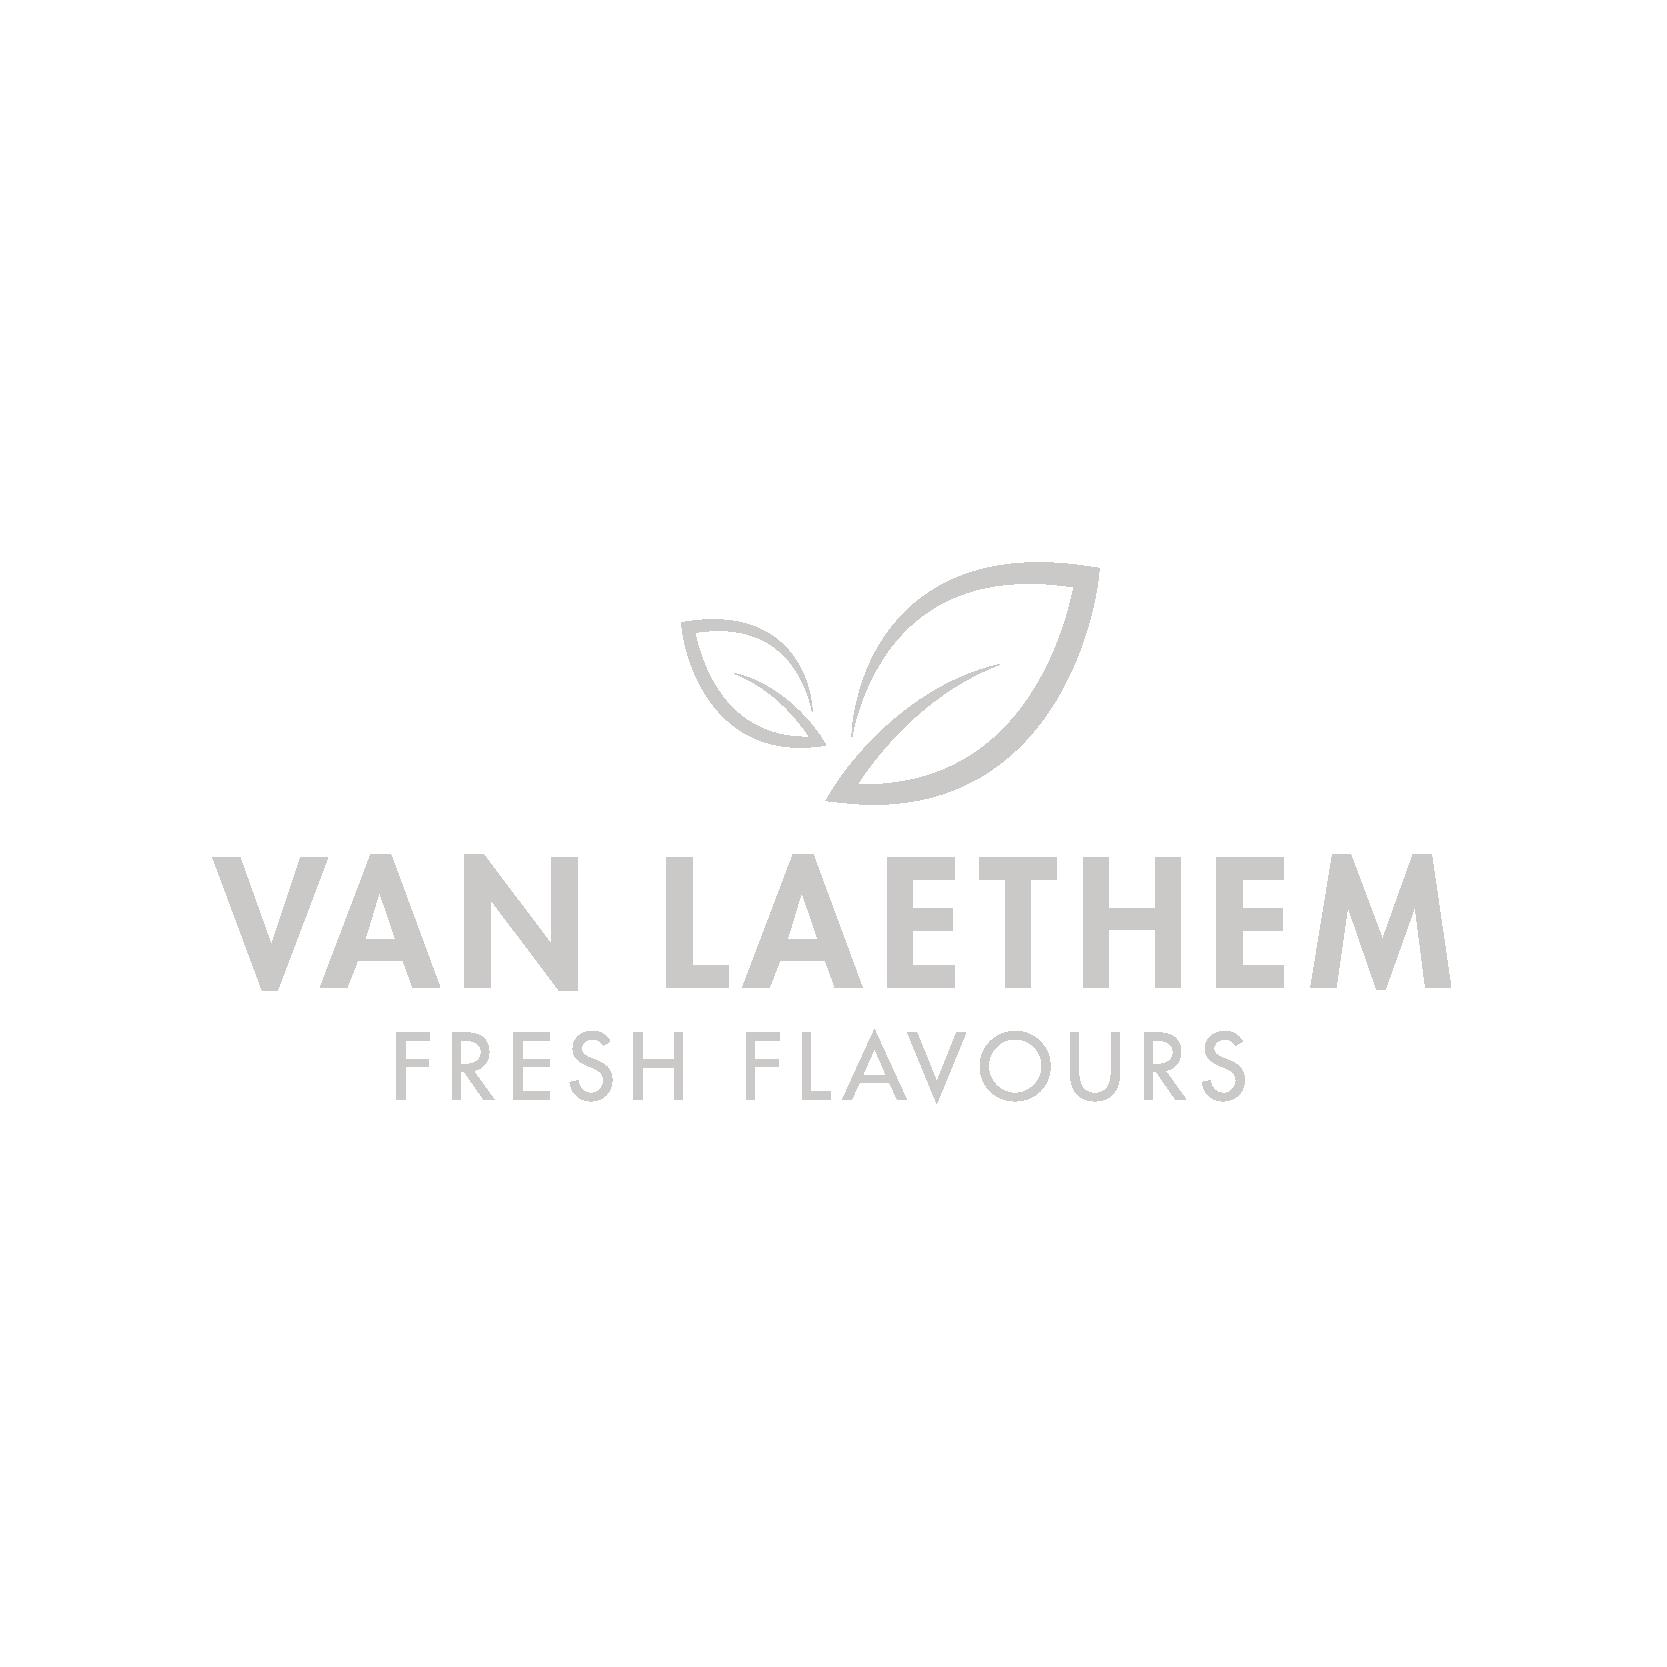 Logo van Van Laethem